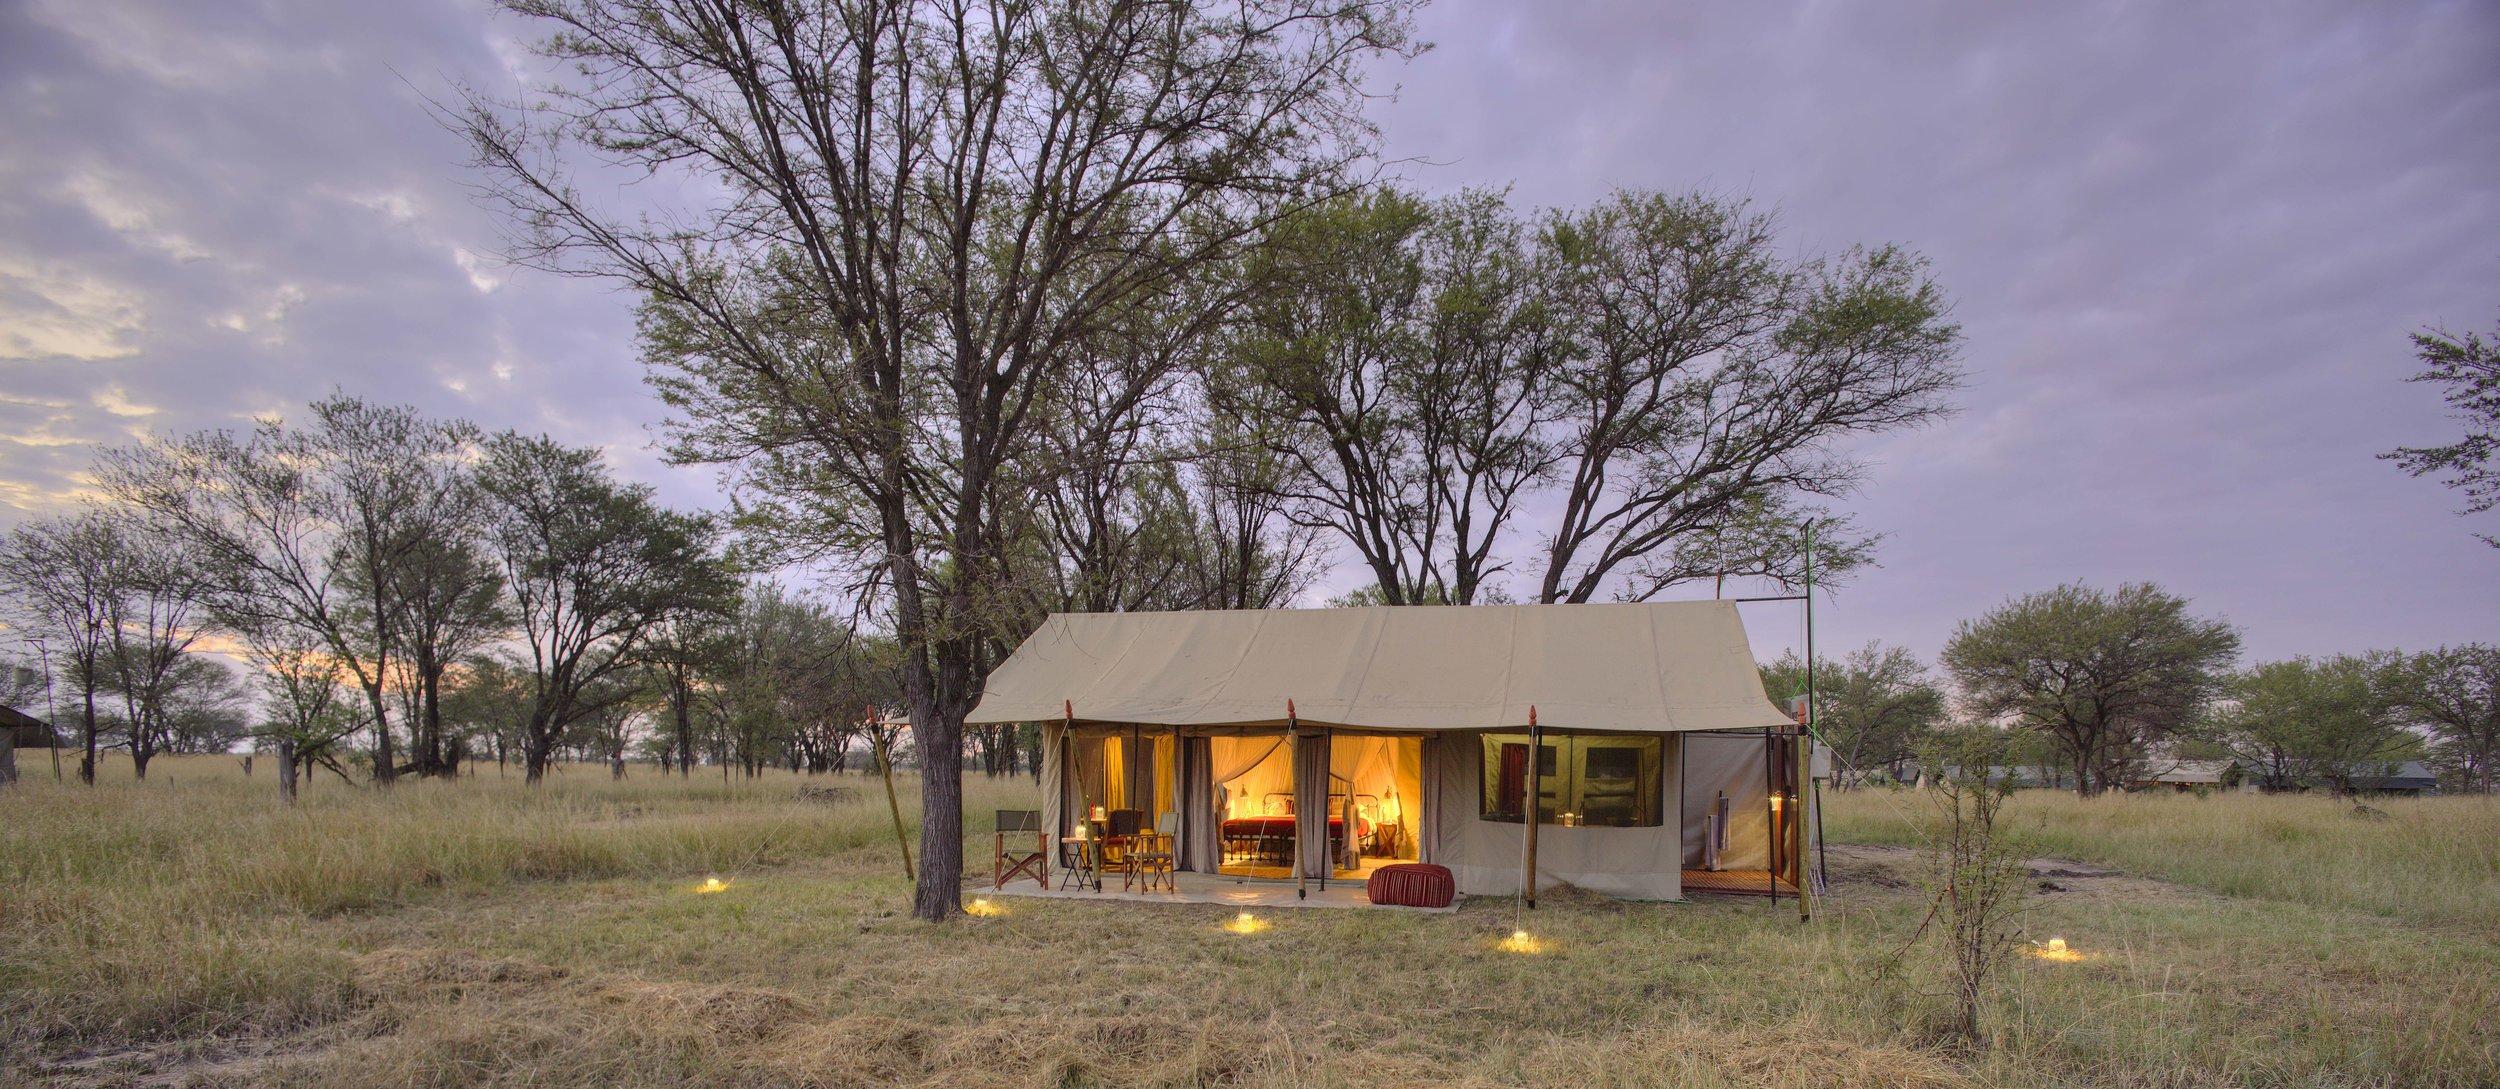 kimondo-camp-tent-exterior.jpg